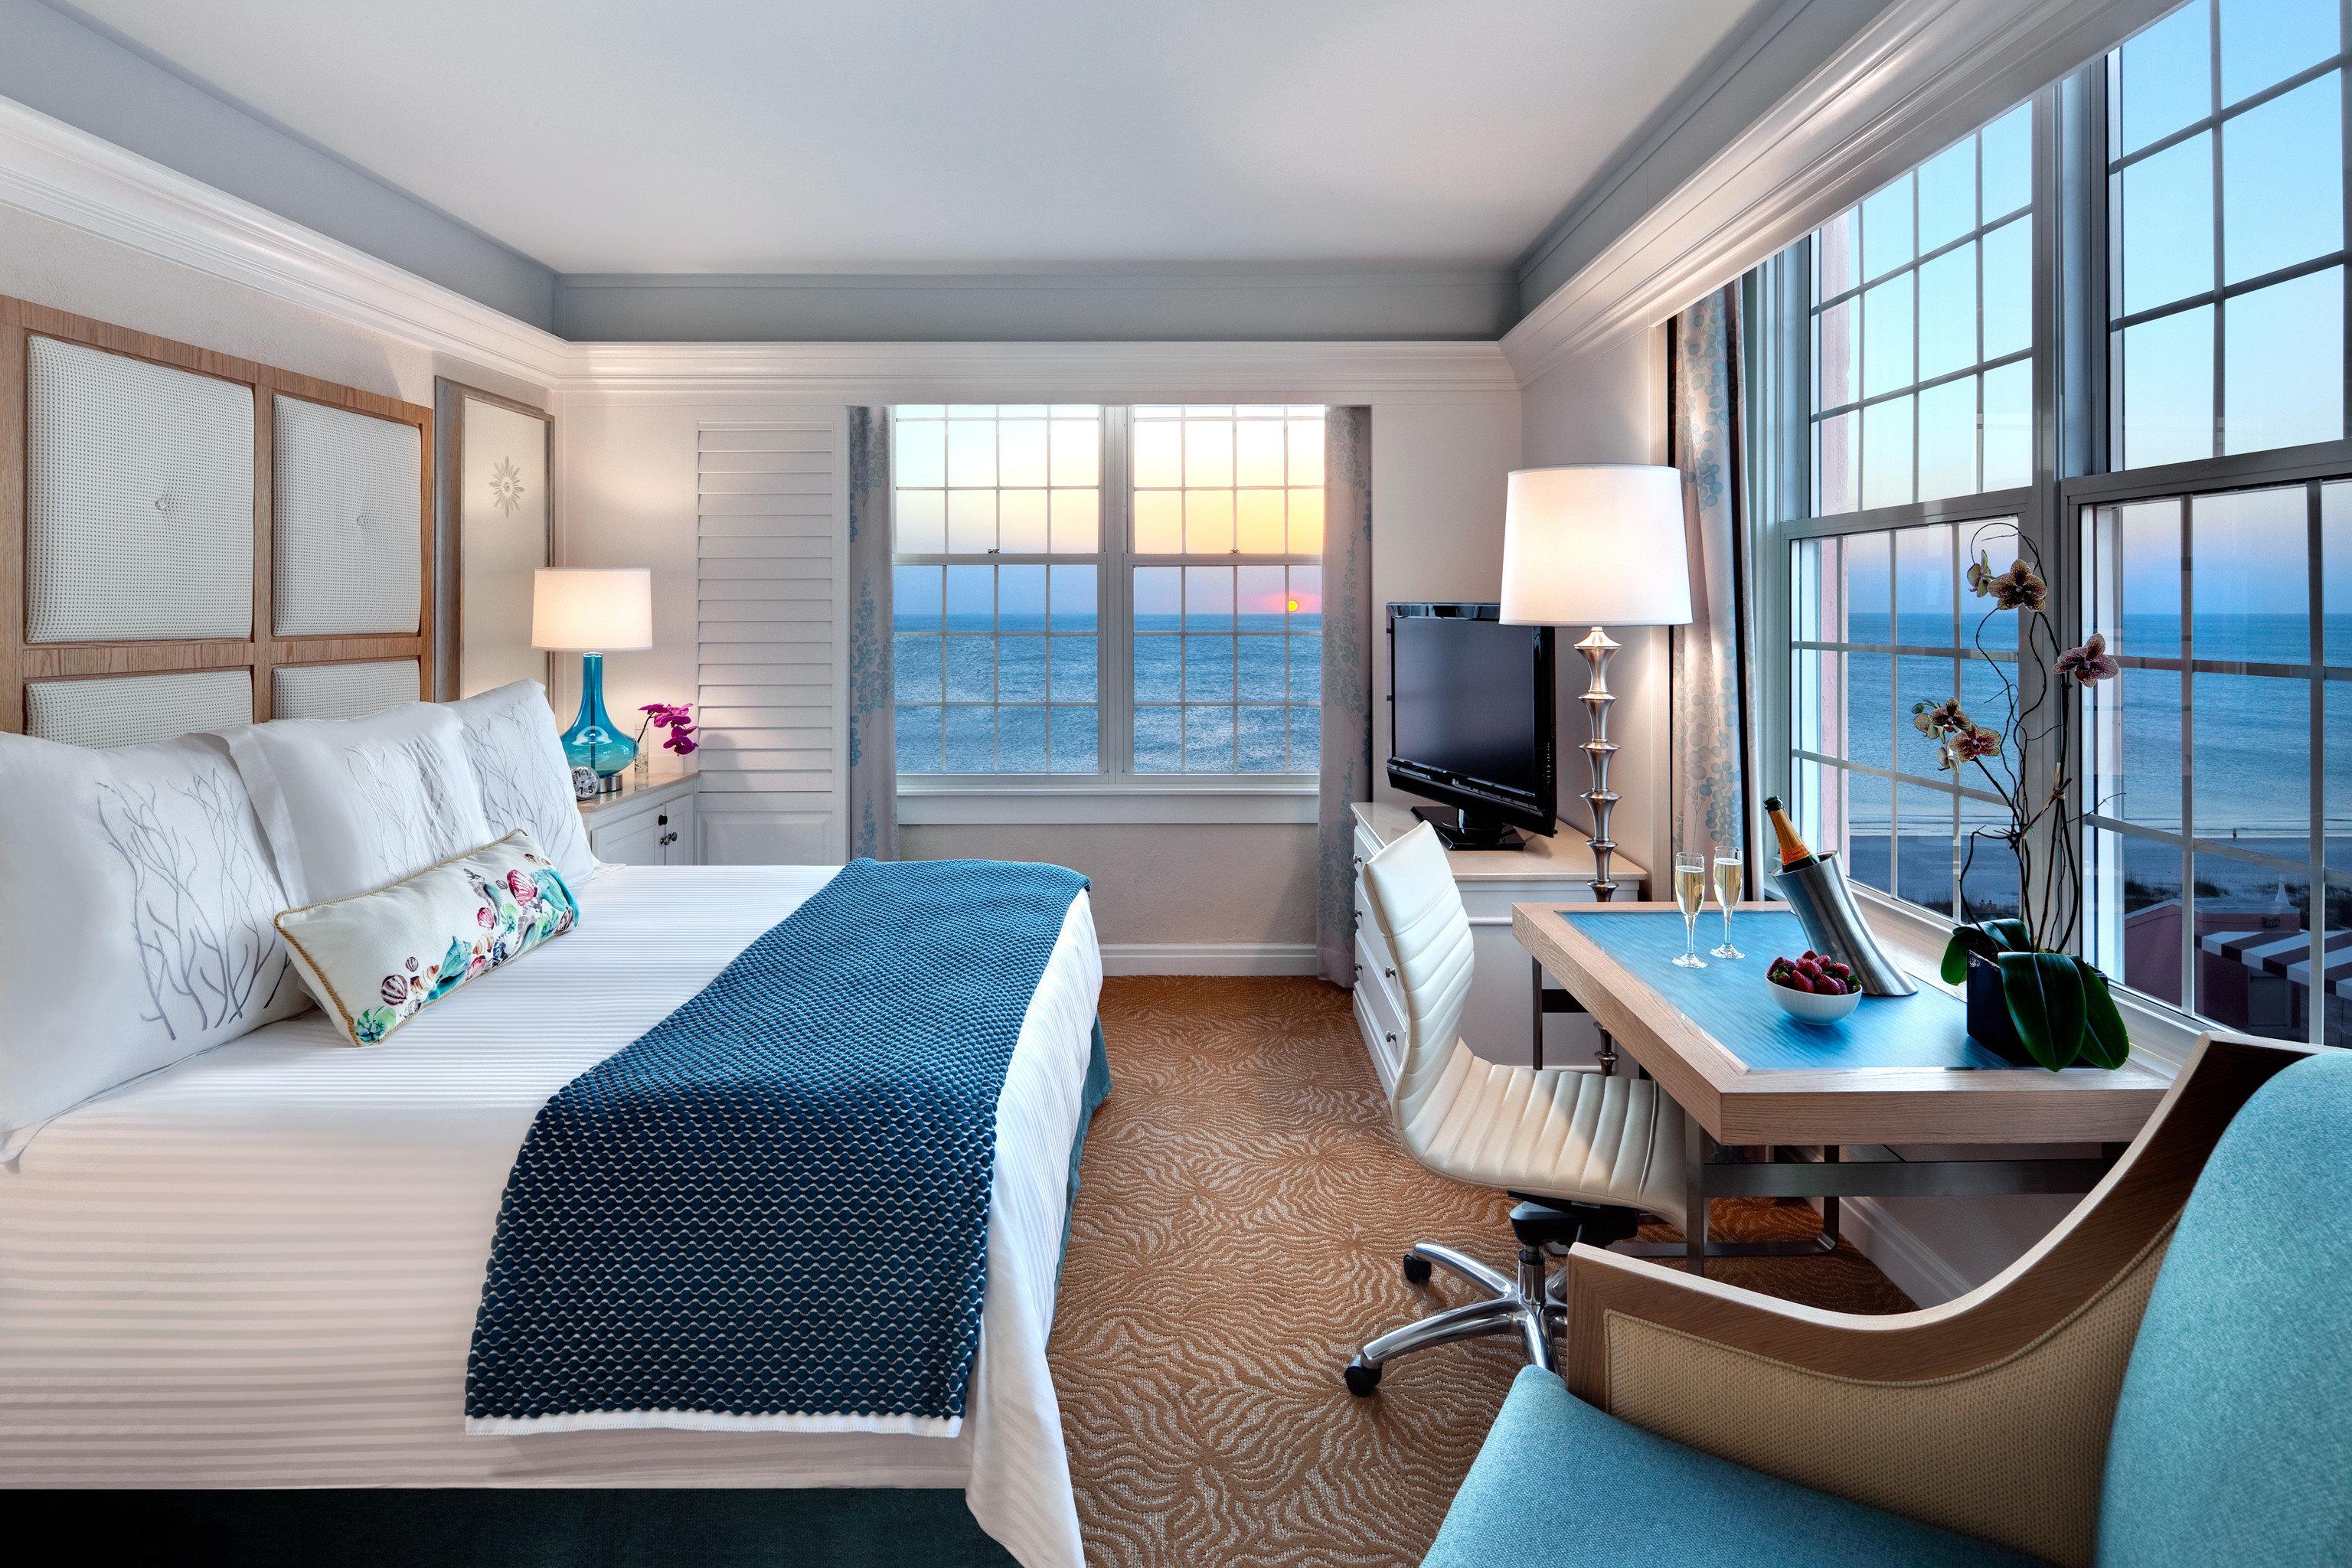 Beachfront Bedroom Classic Family Florida Miami Resort Trip Ideas Weekend Getaways property Suite condominium living room home